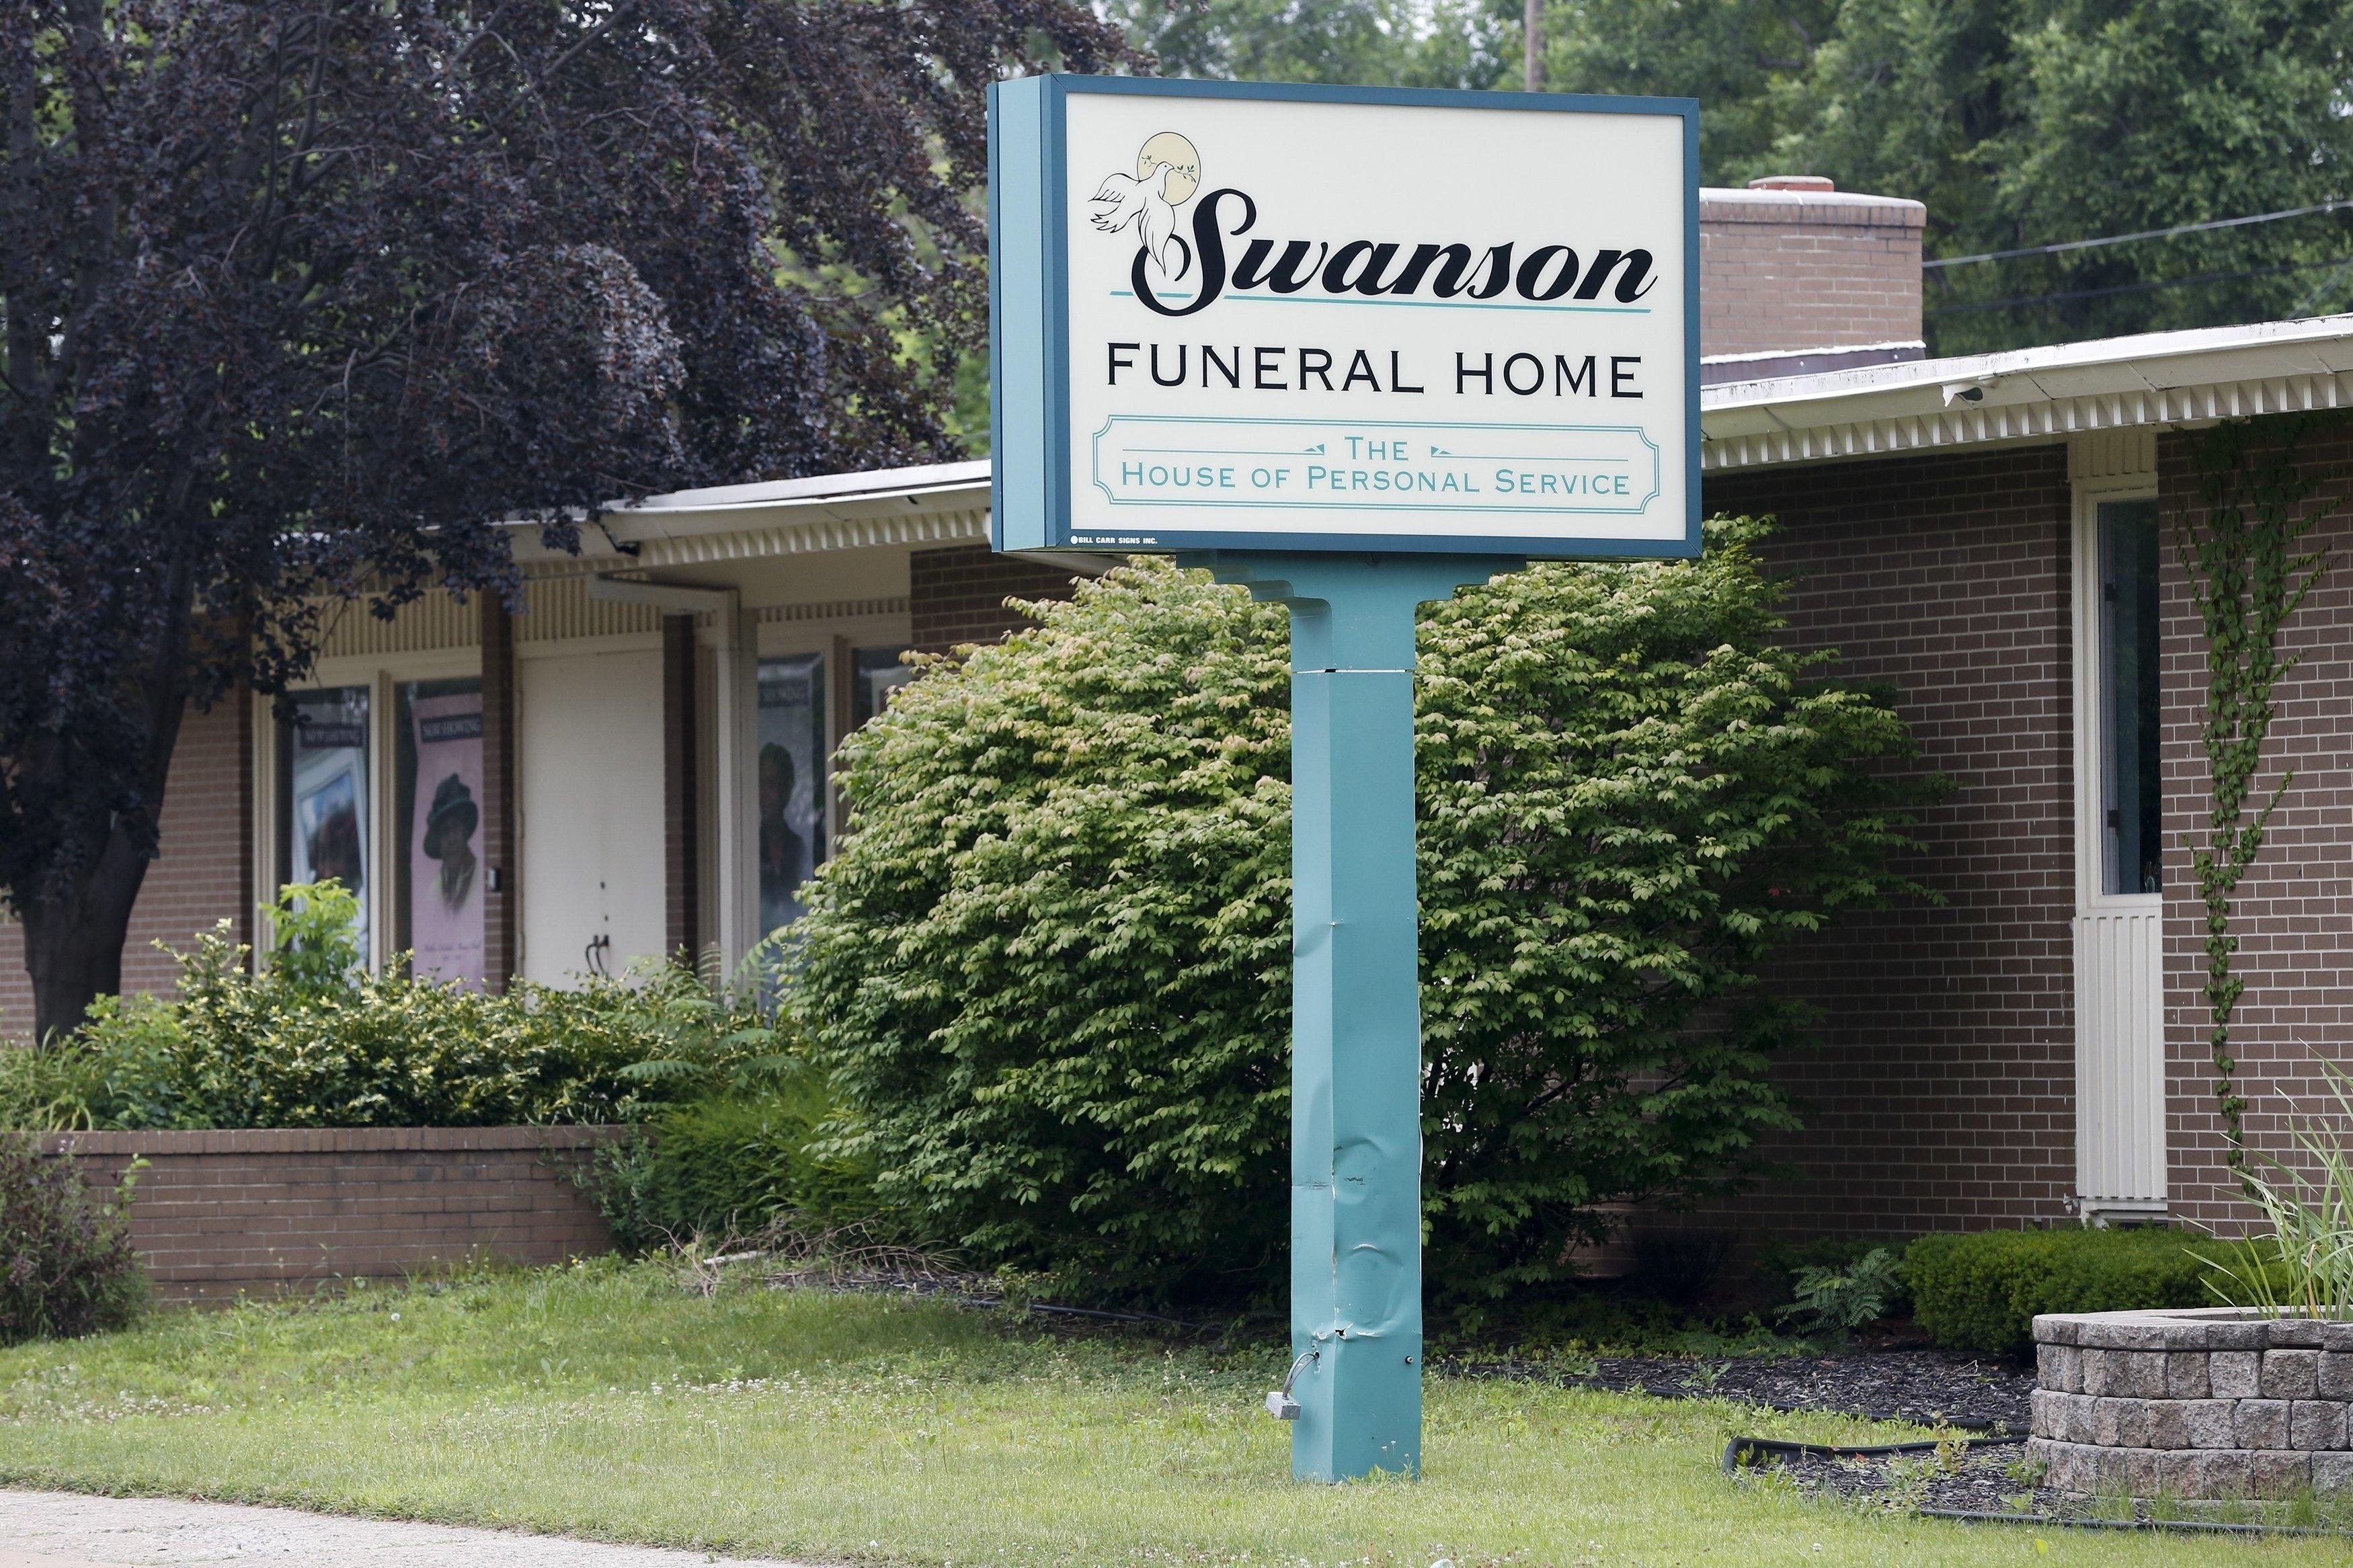 Funeral home horrors put spotlight on spotty US regulations